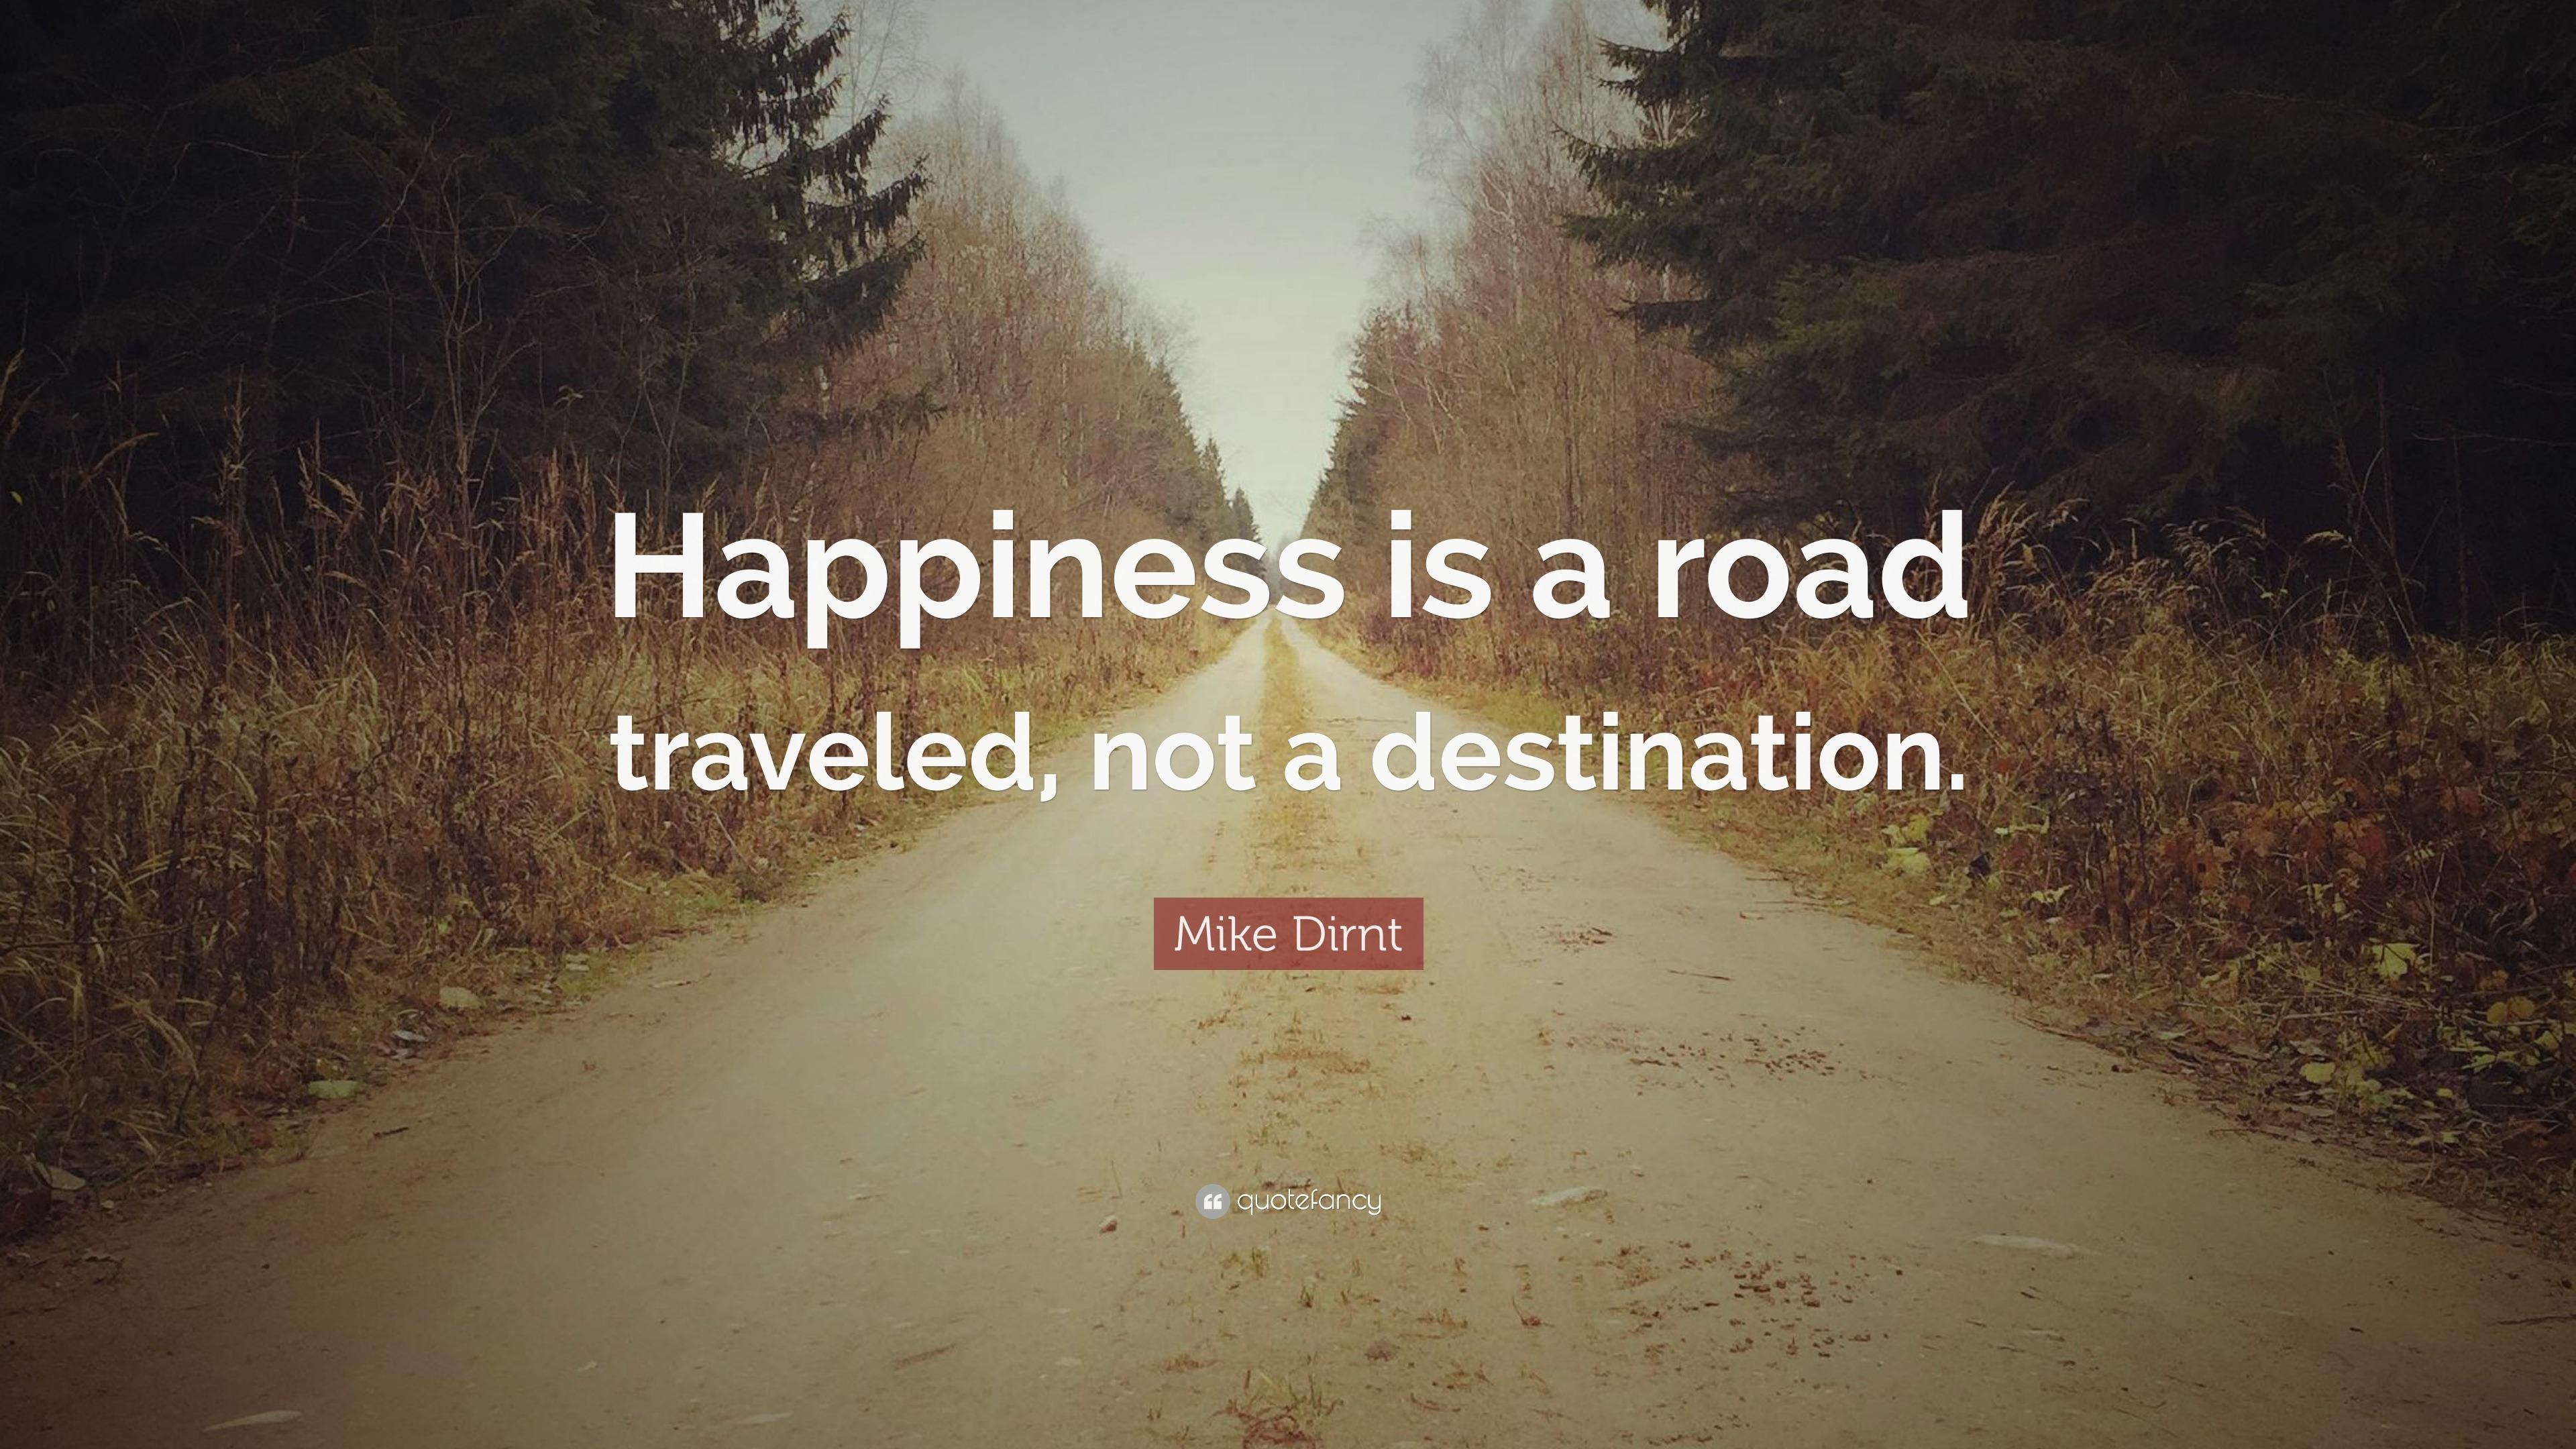 Top 40 Destination Quotes 2021 Edition Free Images Quotefancy